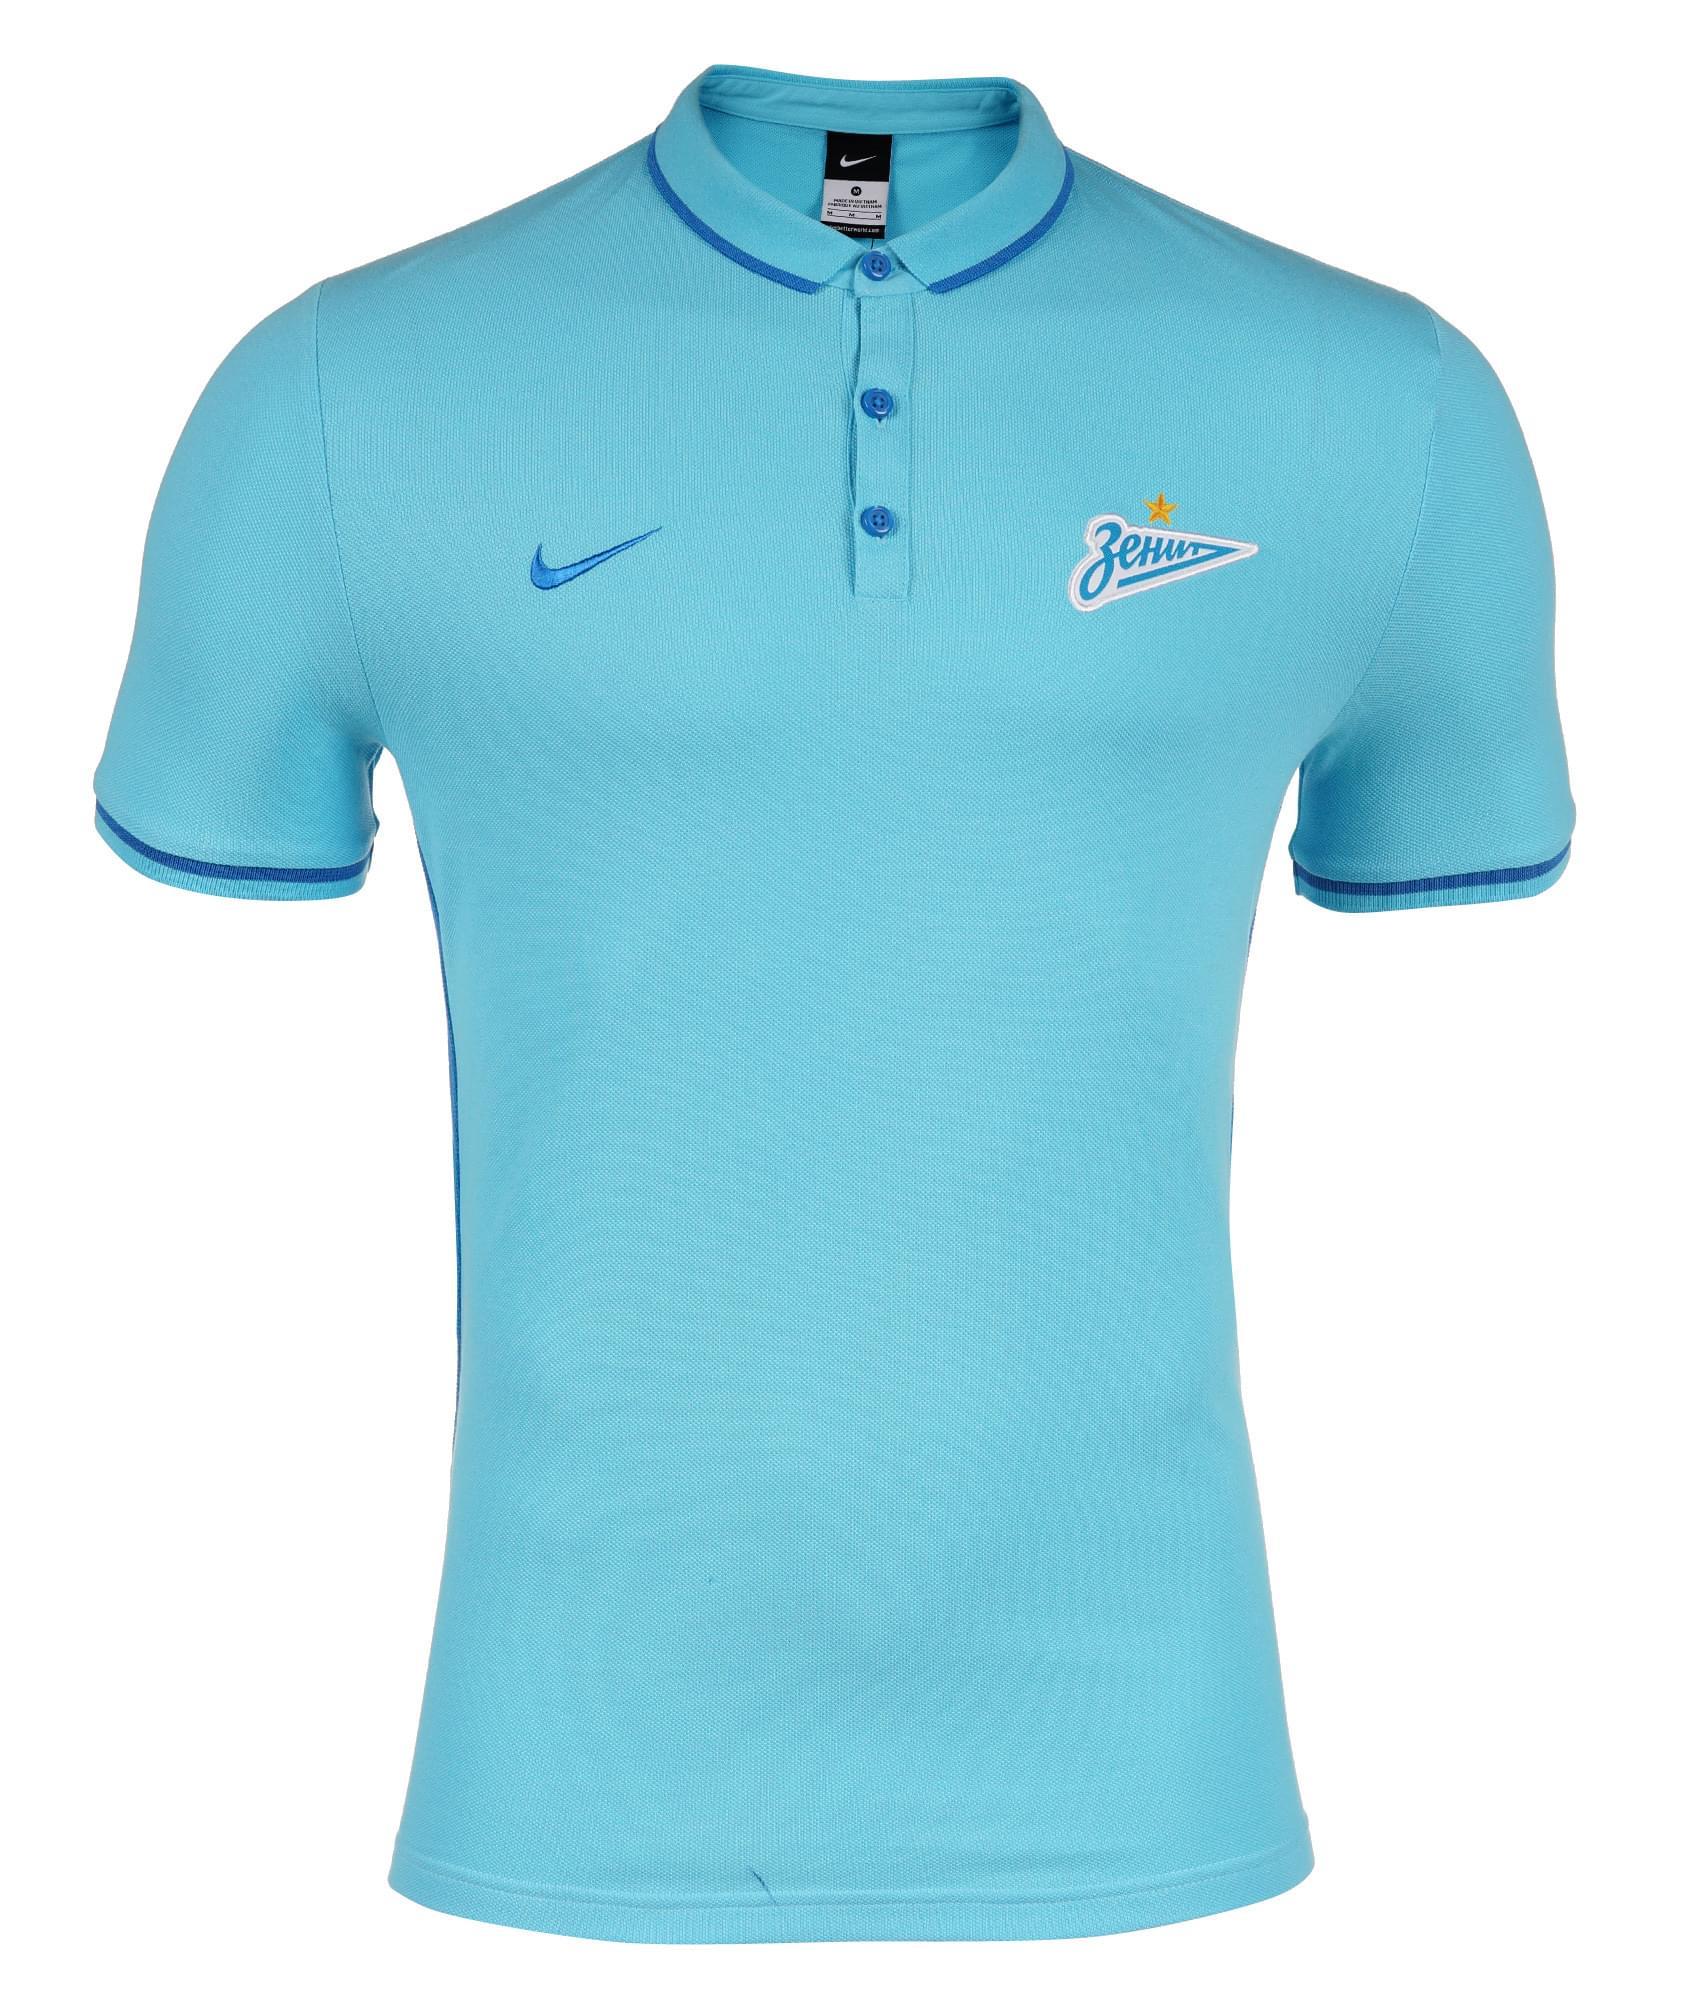 Поло Nike LGE ZENITH AUTH POLO, Цвет-Голубой, Размер-S поло nike размер s